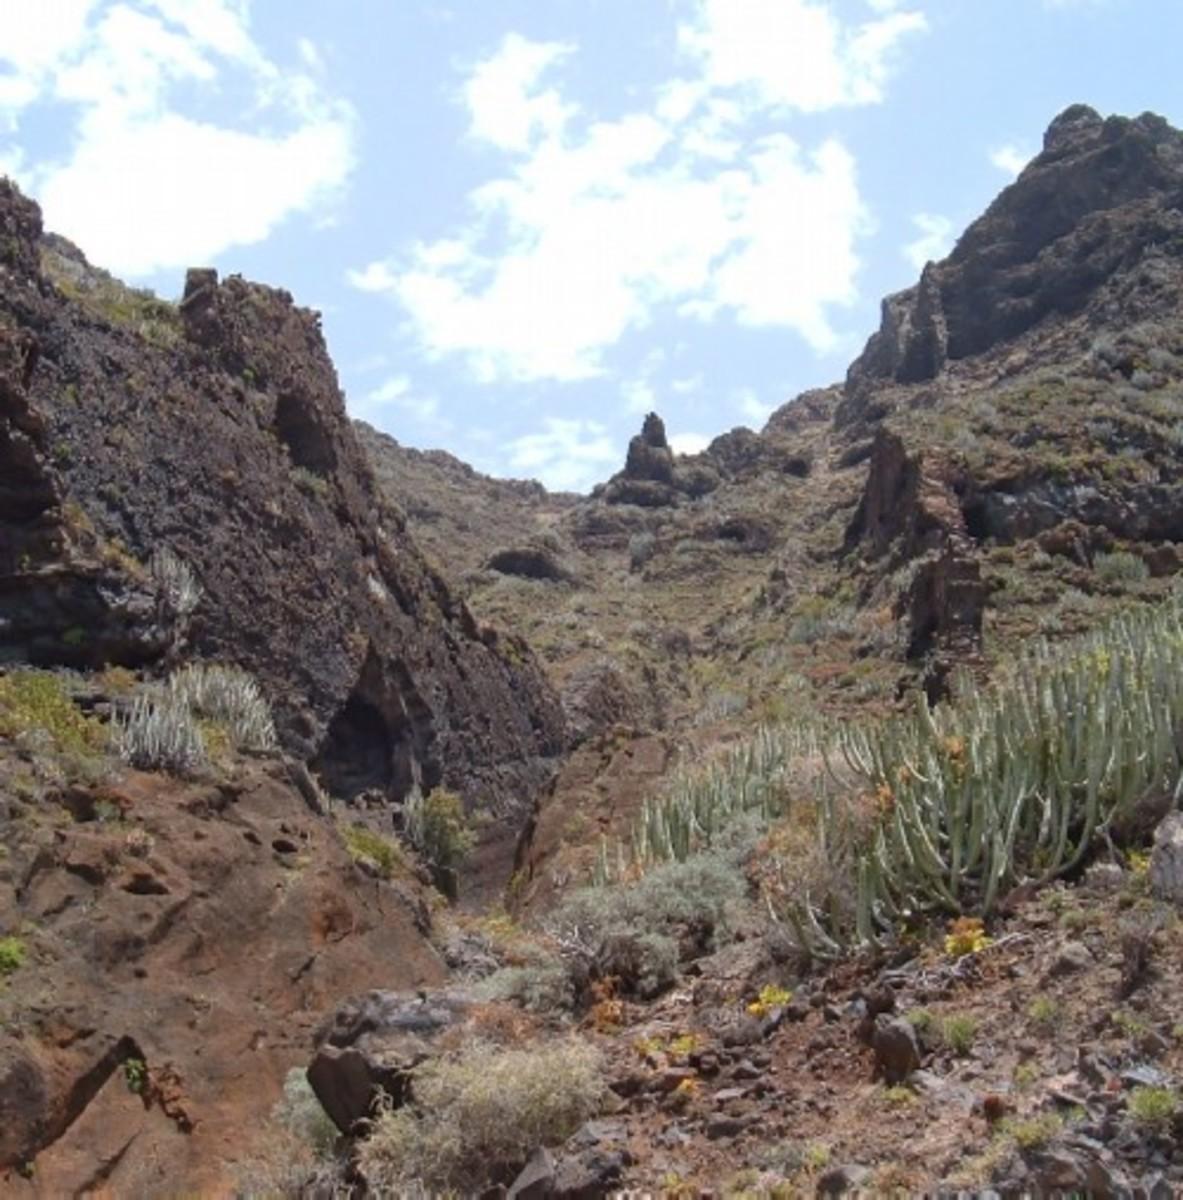 The road from Tenerife's Buenavista to Punta de Teno